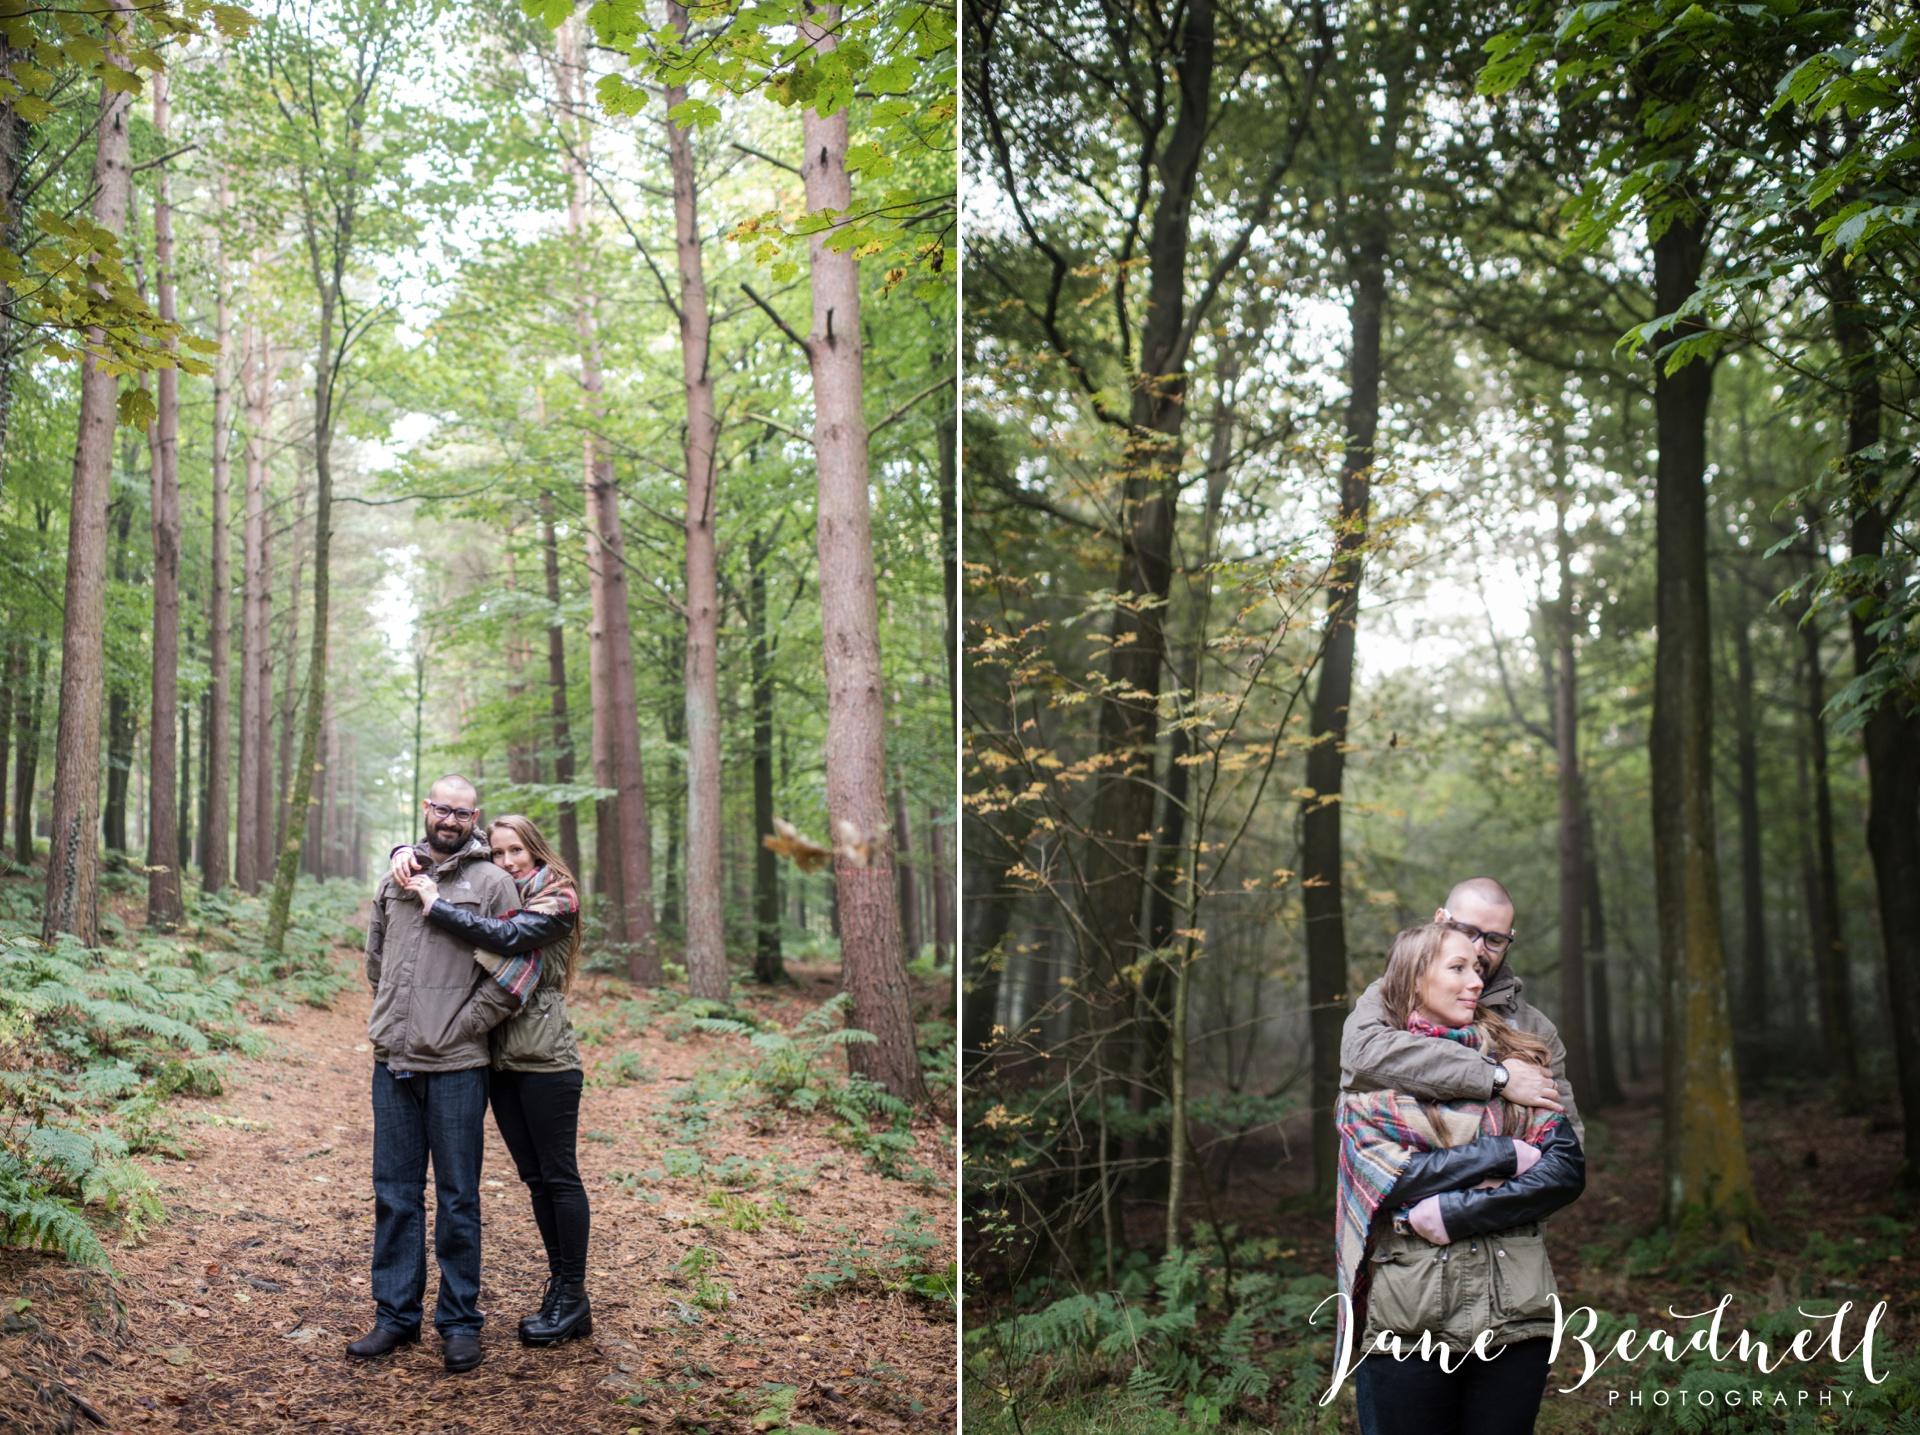 Jane Beadnell fine art wedding photographer engagement photography Otley_0009